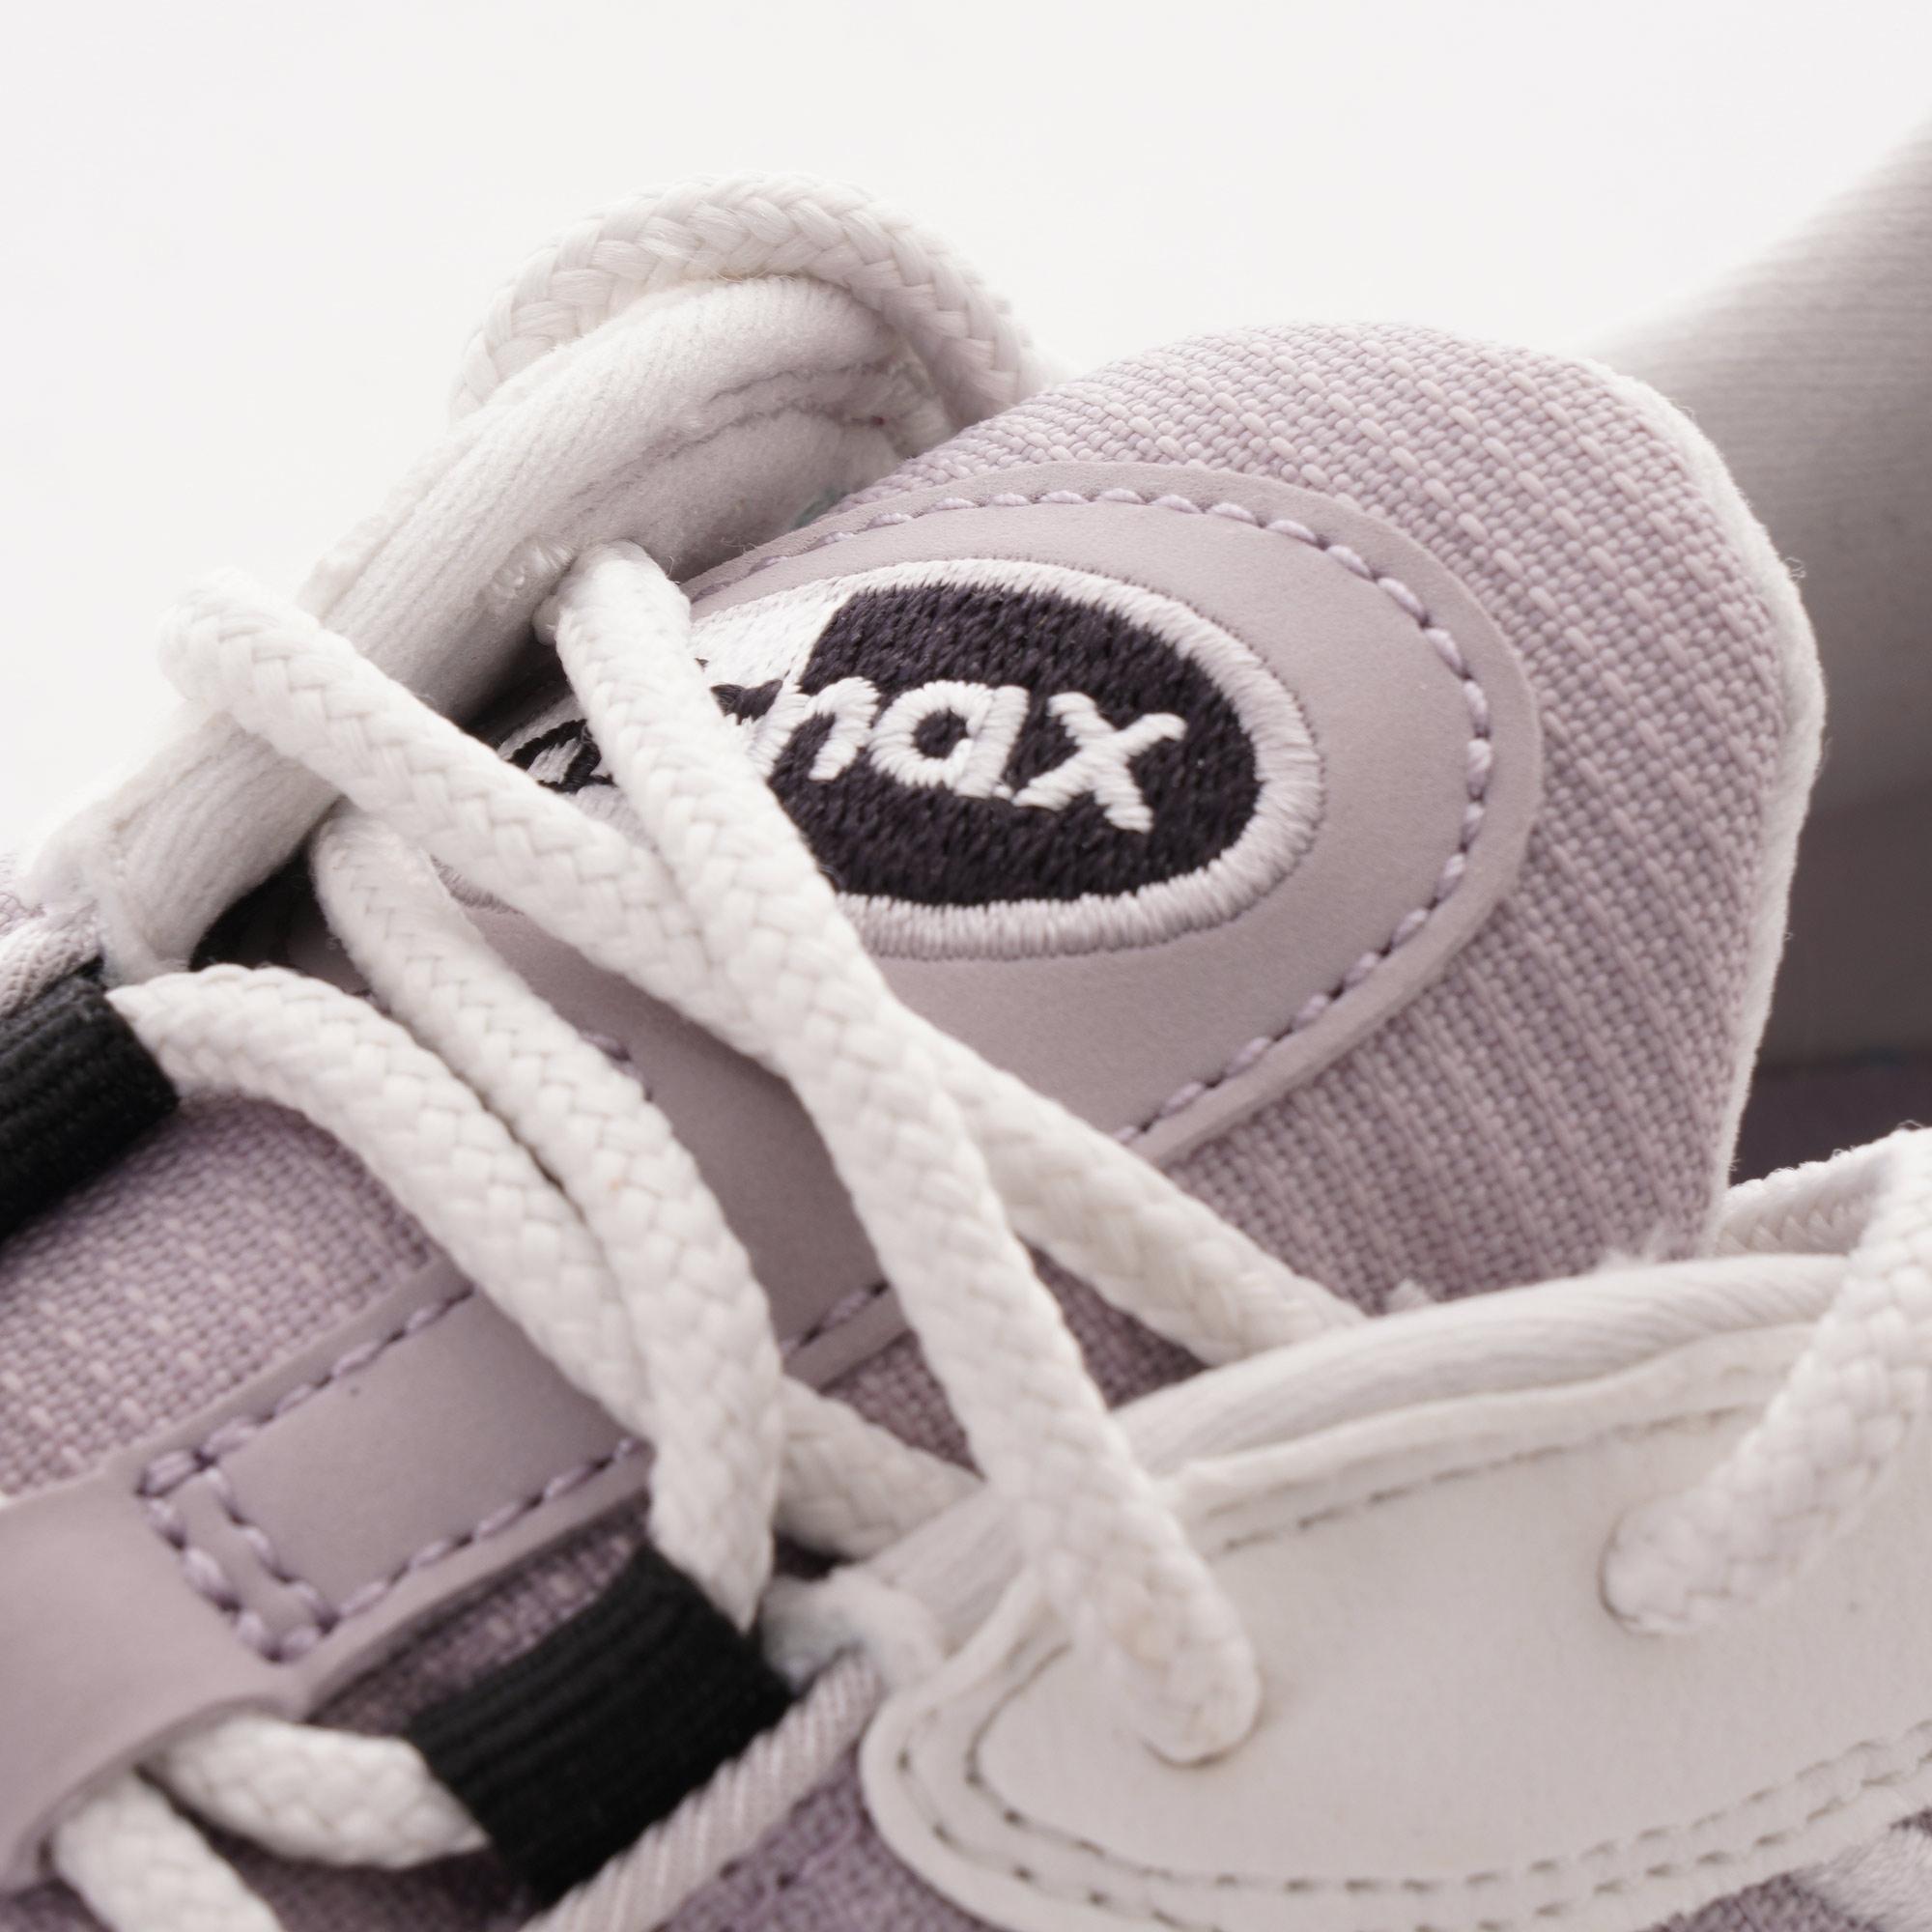 Nike Womens Air Max 98 Lilac And Silver Ci3709 001